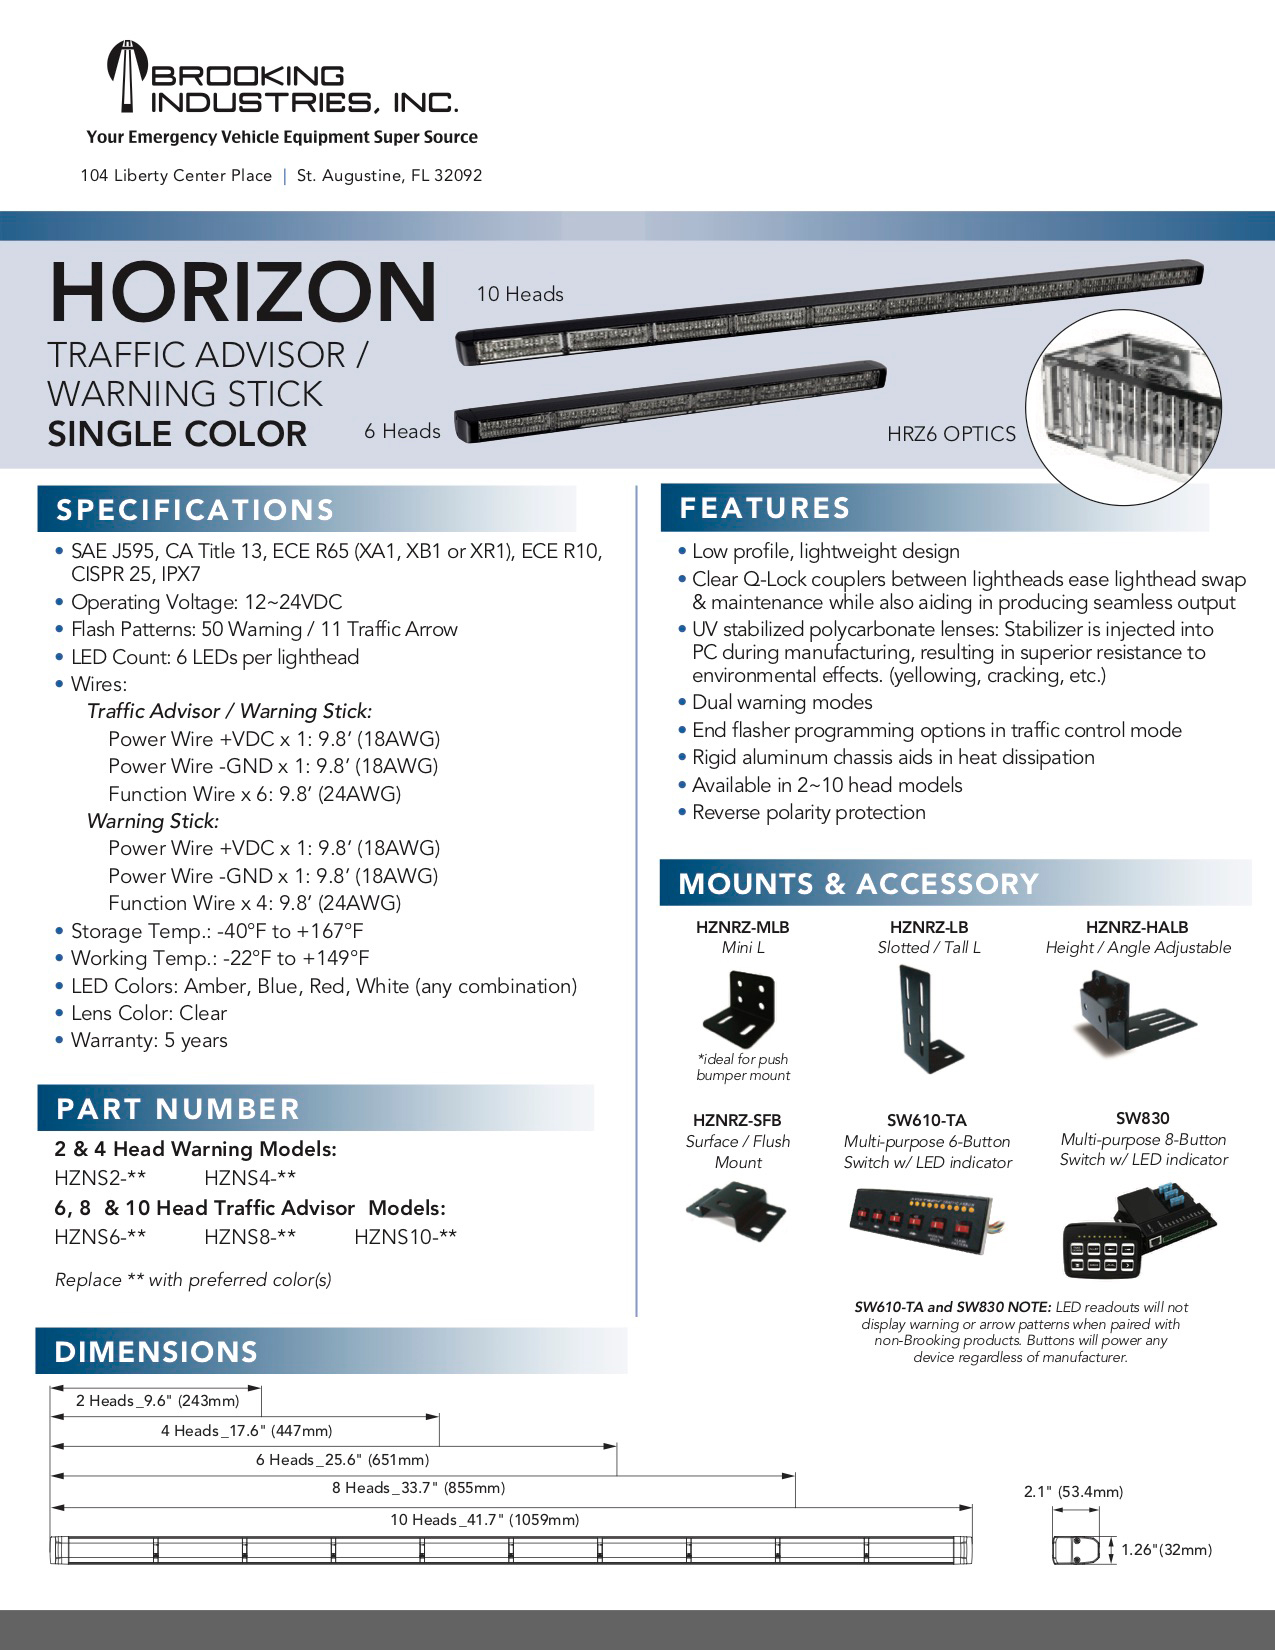 horizon-single-color-warning-stick-spec-sheet.jpg